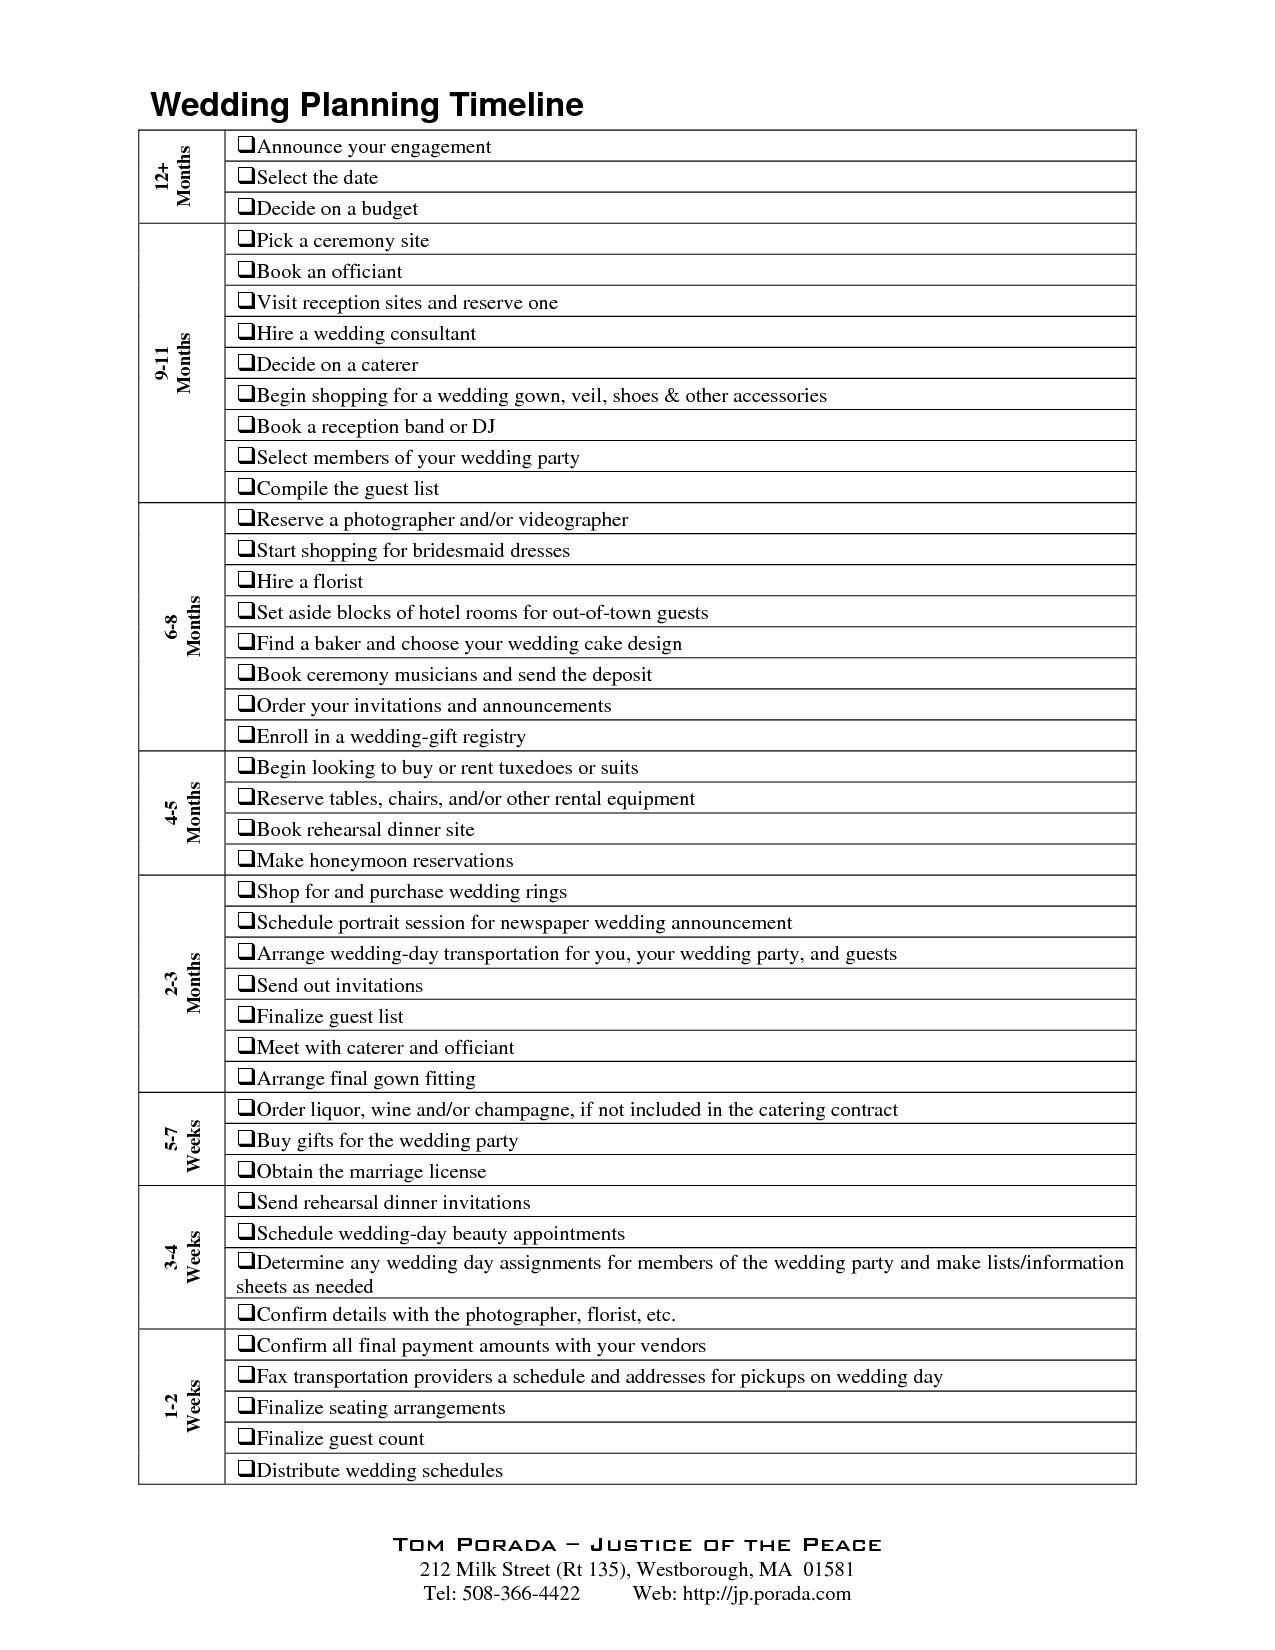 Wedding Reception Timeline Template G8nfrcl9